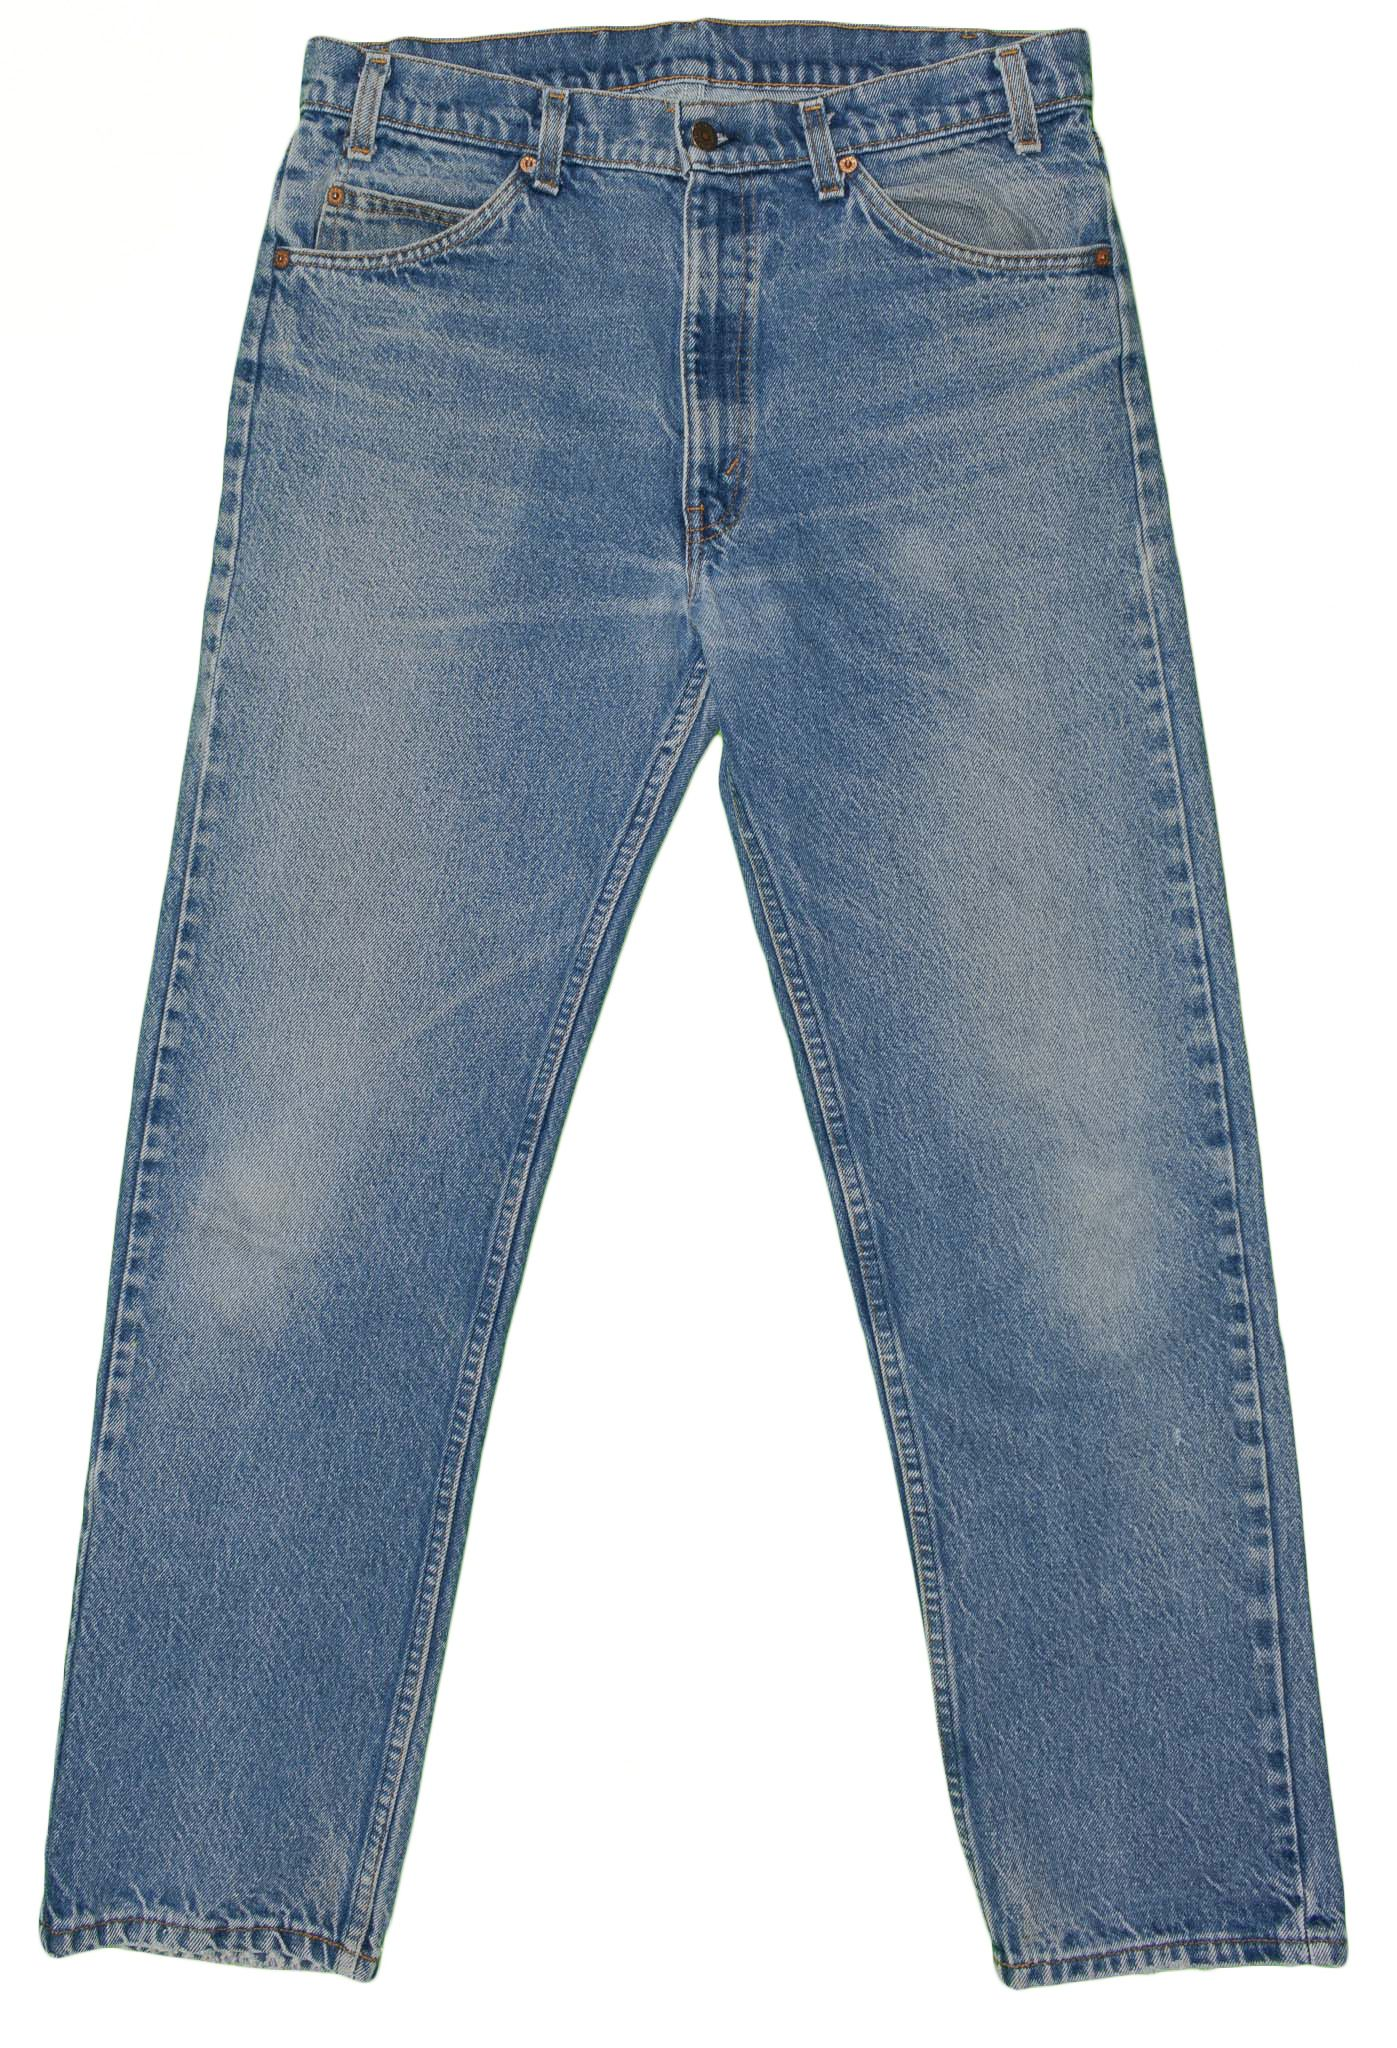 69aad2fbc39 Vintage Levis 505 Denim Jeans Men's 35x31 Talon 42 Zip 80's Made USA Orange  Tab #